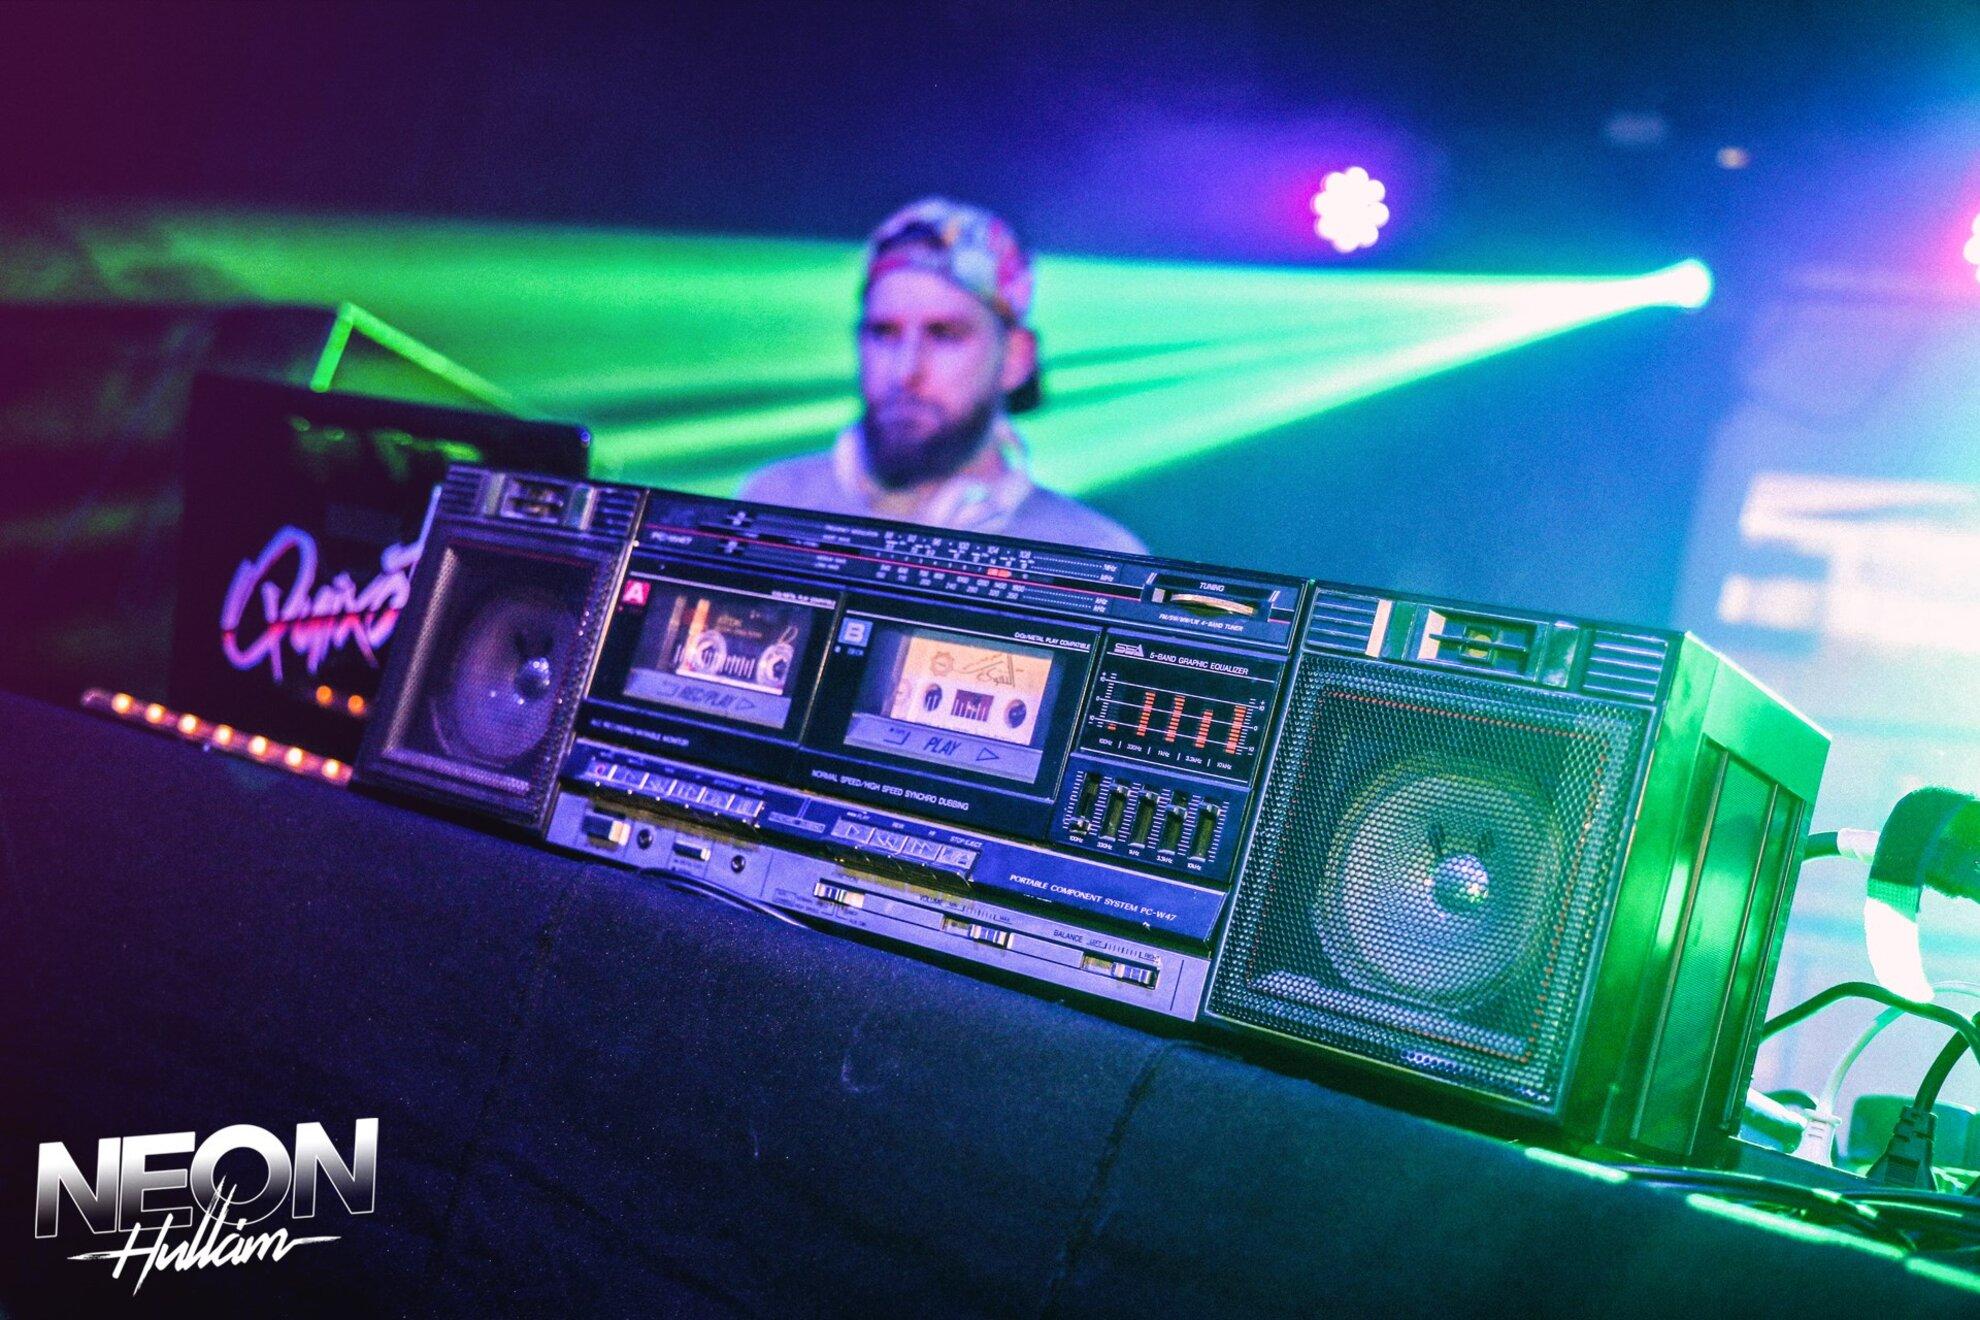 Neonhullám: Budapest Vice